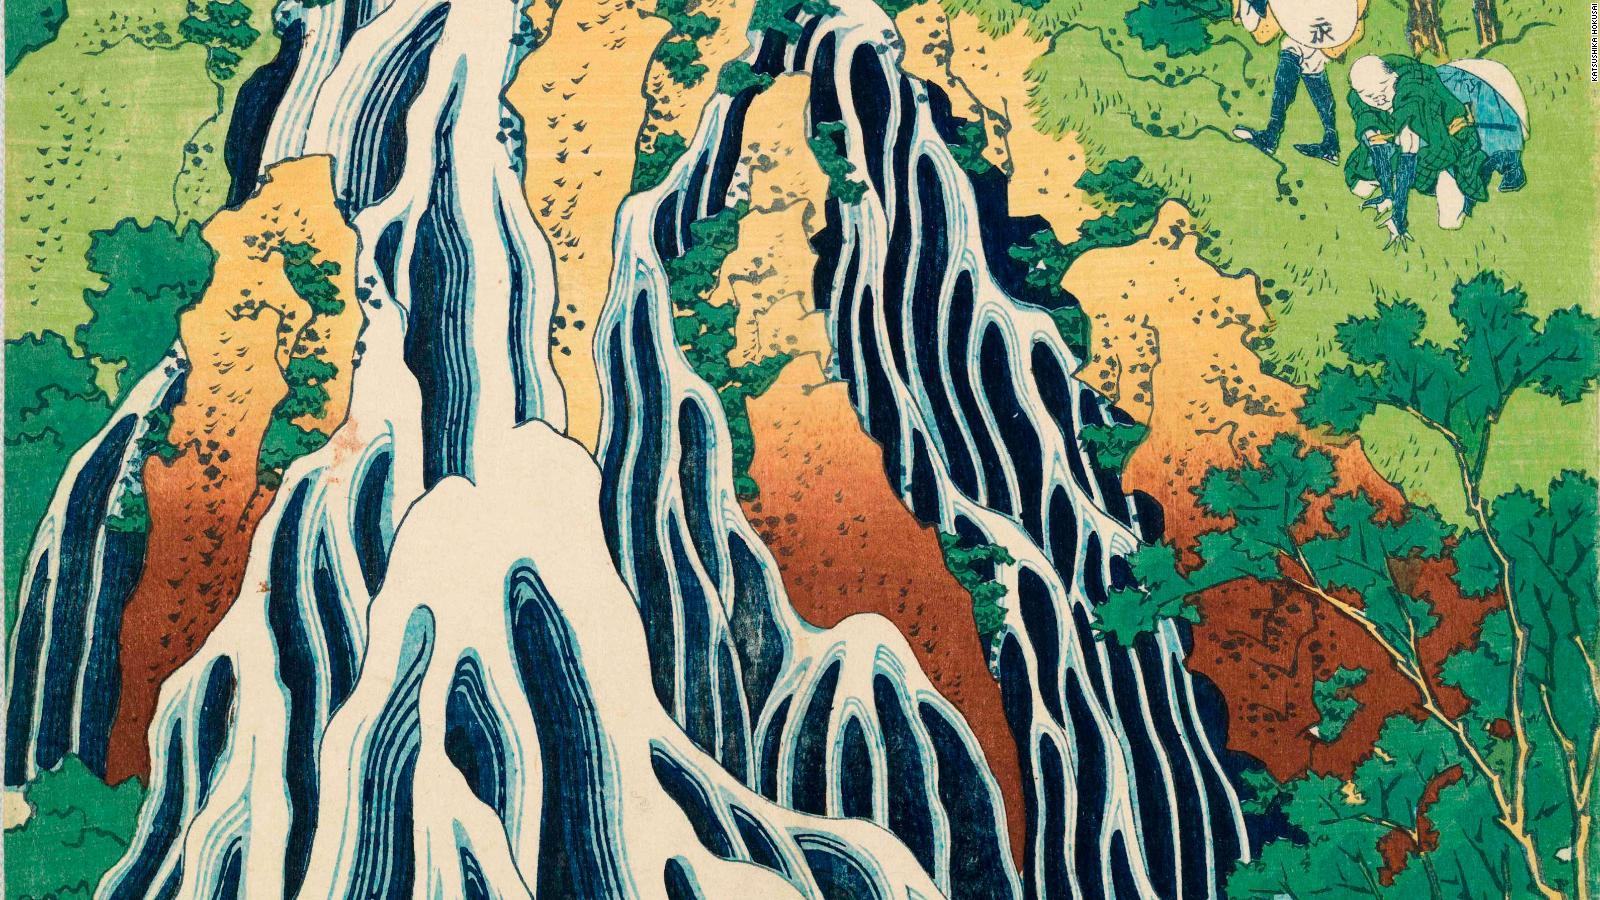 Why The 'great Wave' Has Mystified Art Lovers For Generations - Kirifuri Waterfall At Mount Kurokami In Shimotsuke , HD Wallpaper & Backgrounds